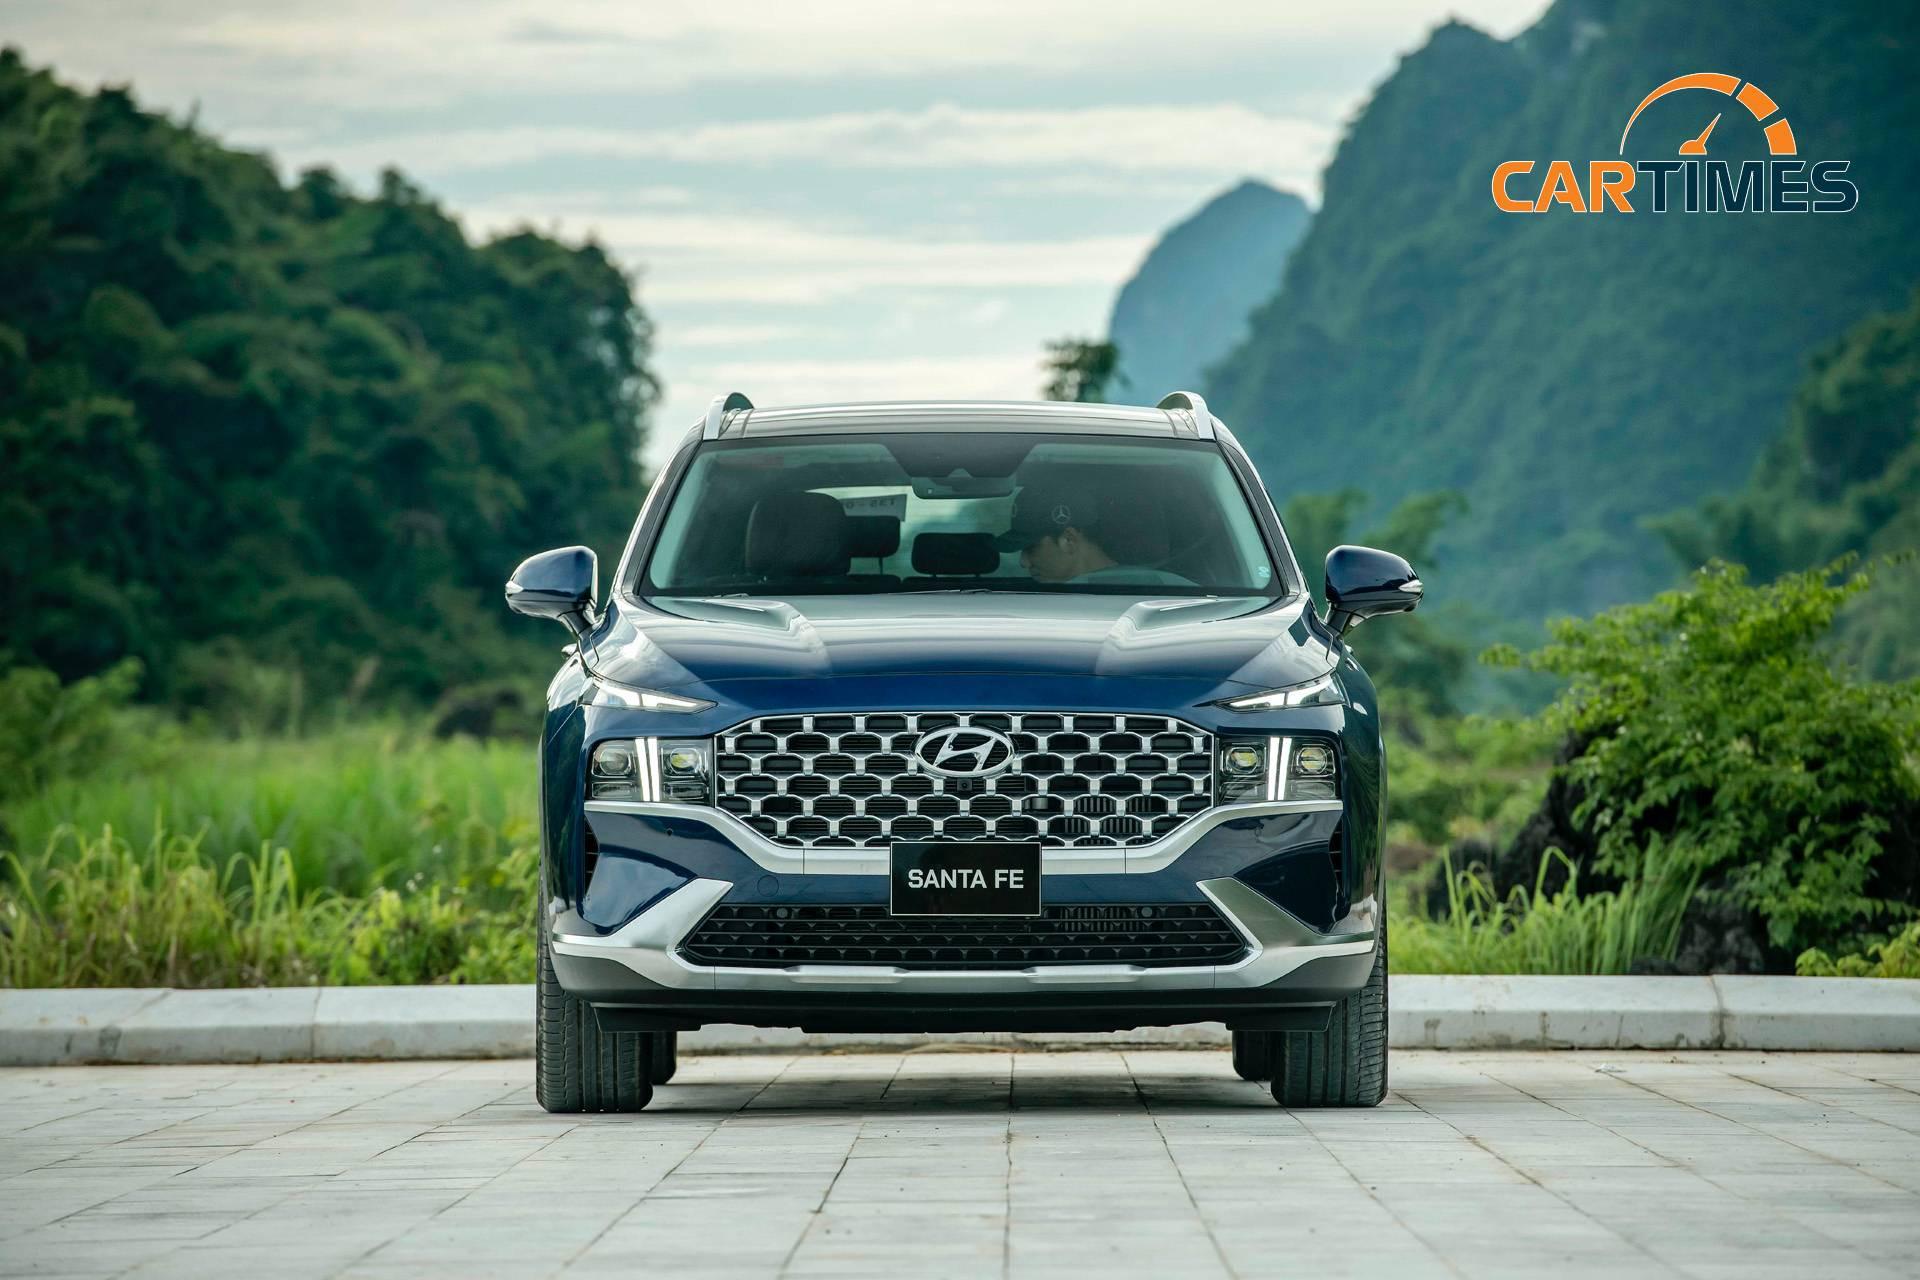 Thiết kế đầu xe Hyundai Santa Fe 2021